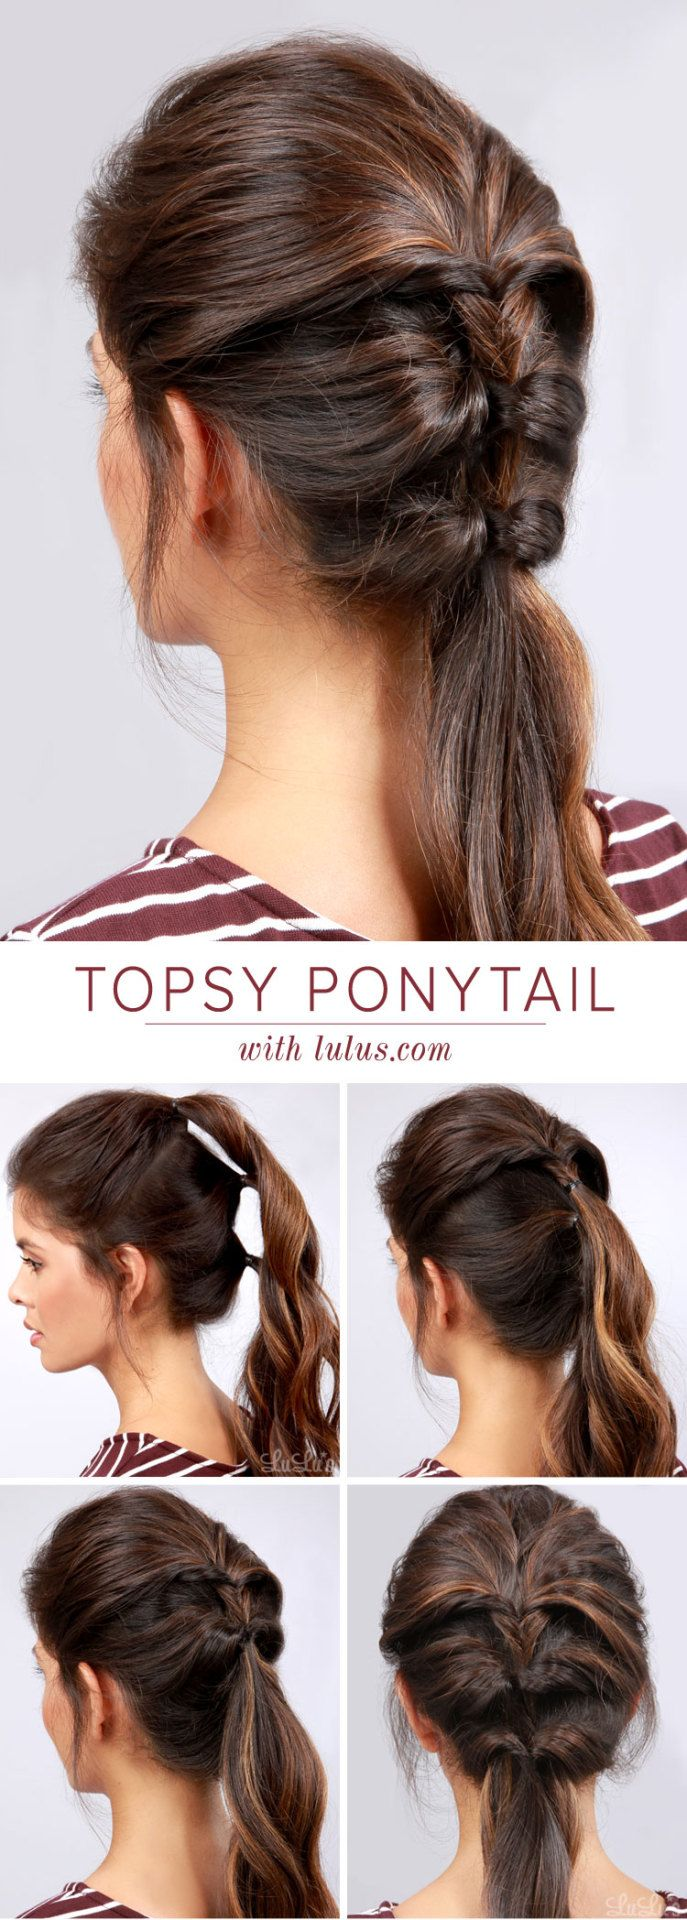 Diy topsy ponytail tutorial rom luluus this only looks braided